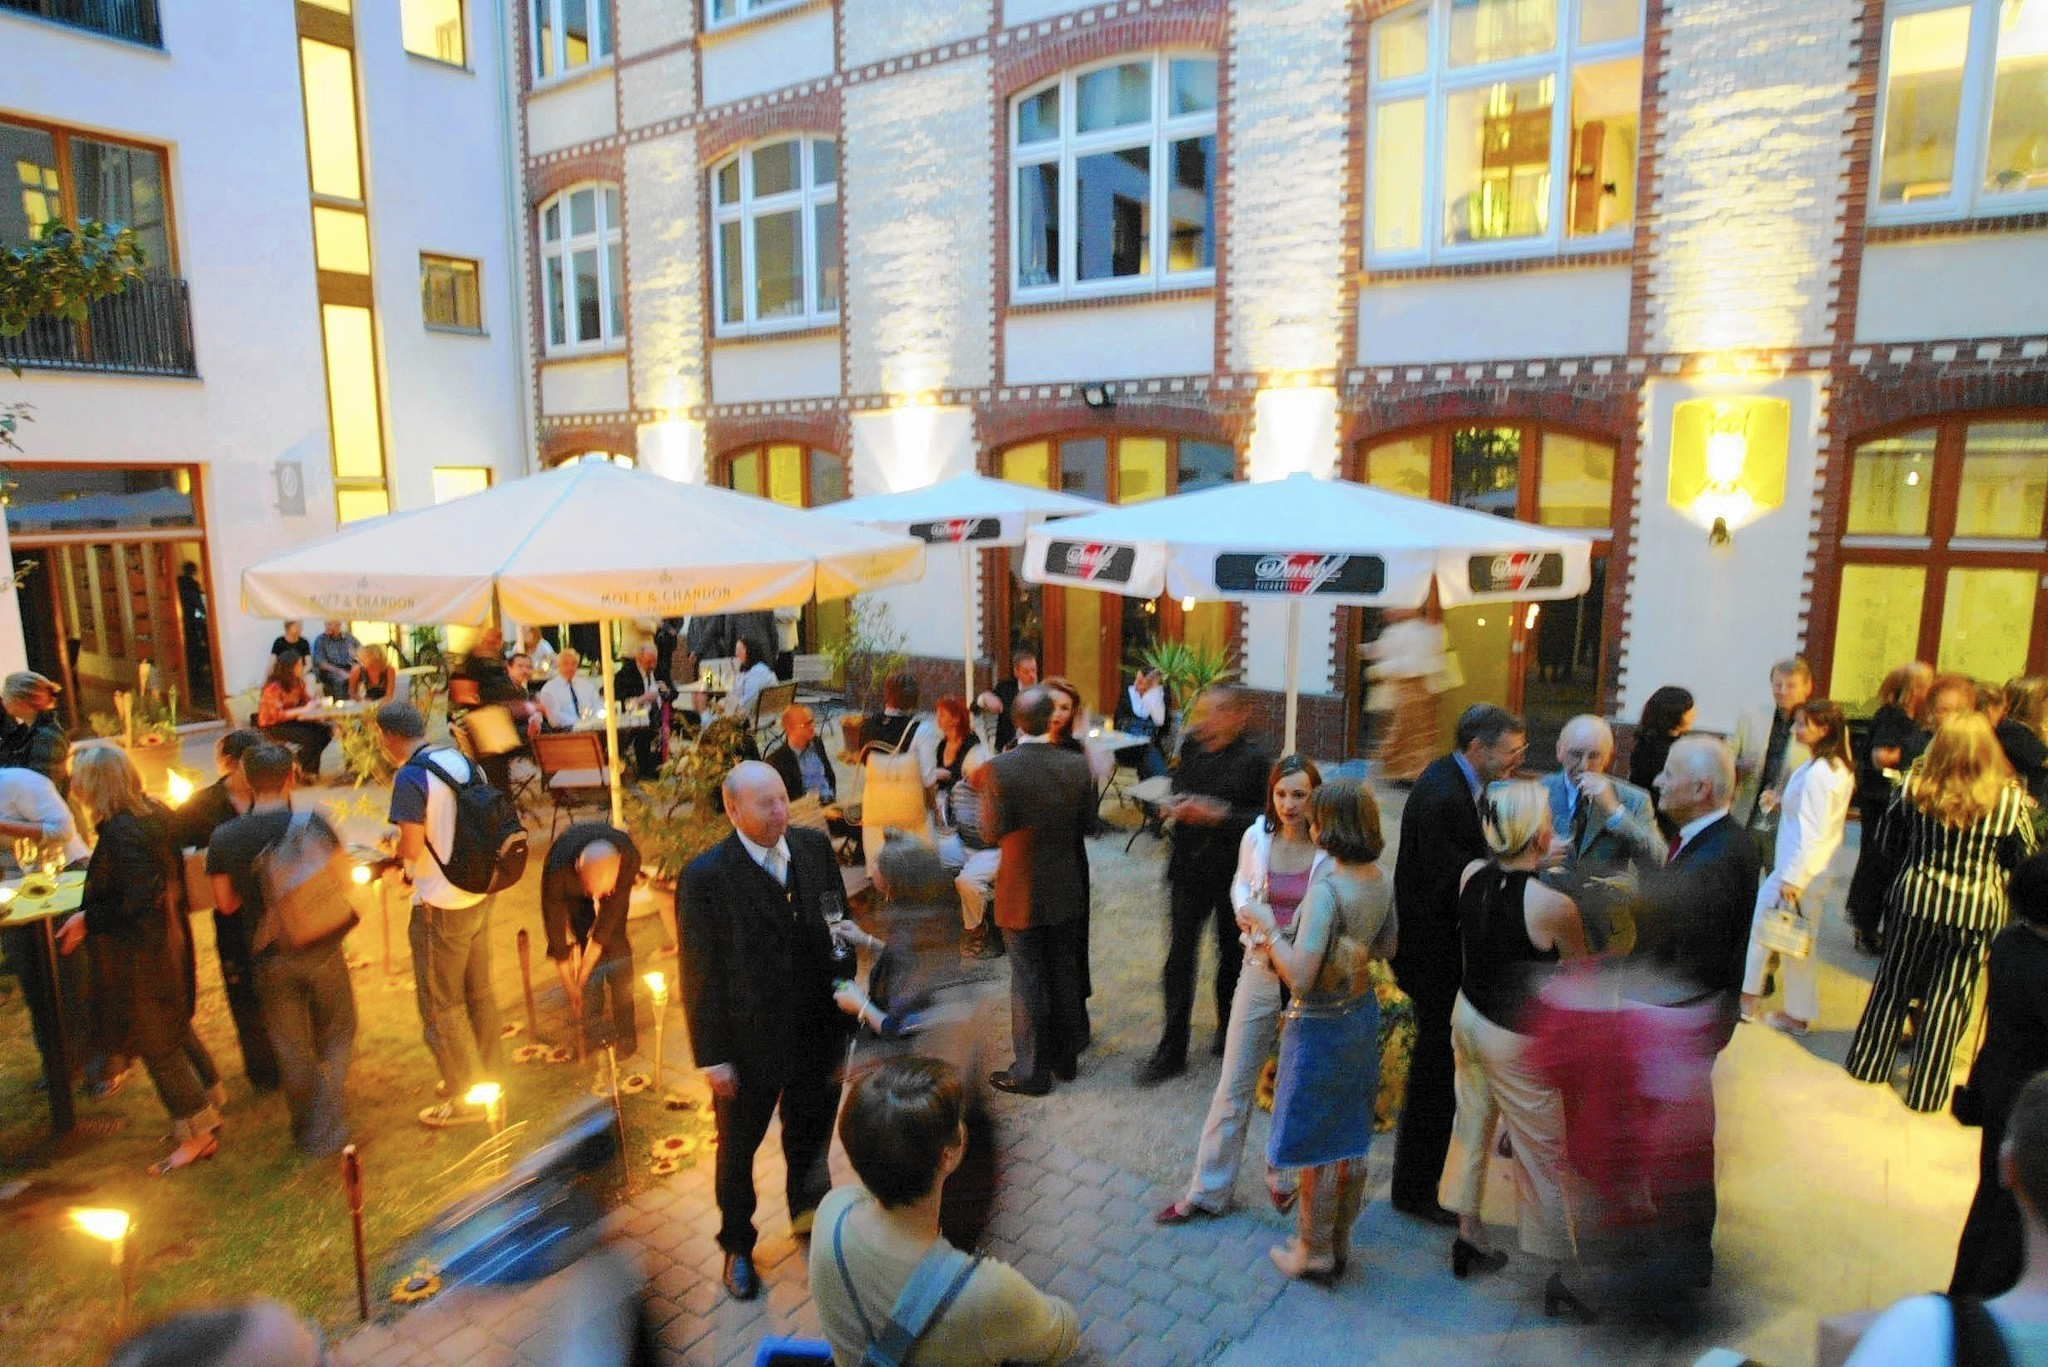 Dining in the dark: 2 Berlin restaurants offer